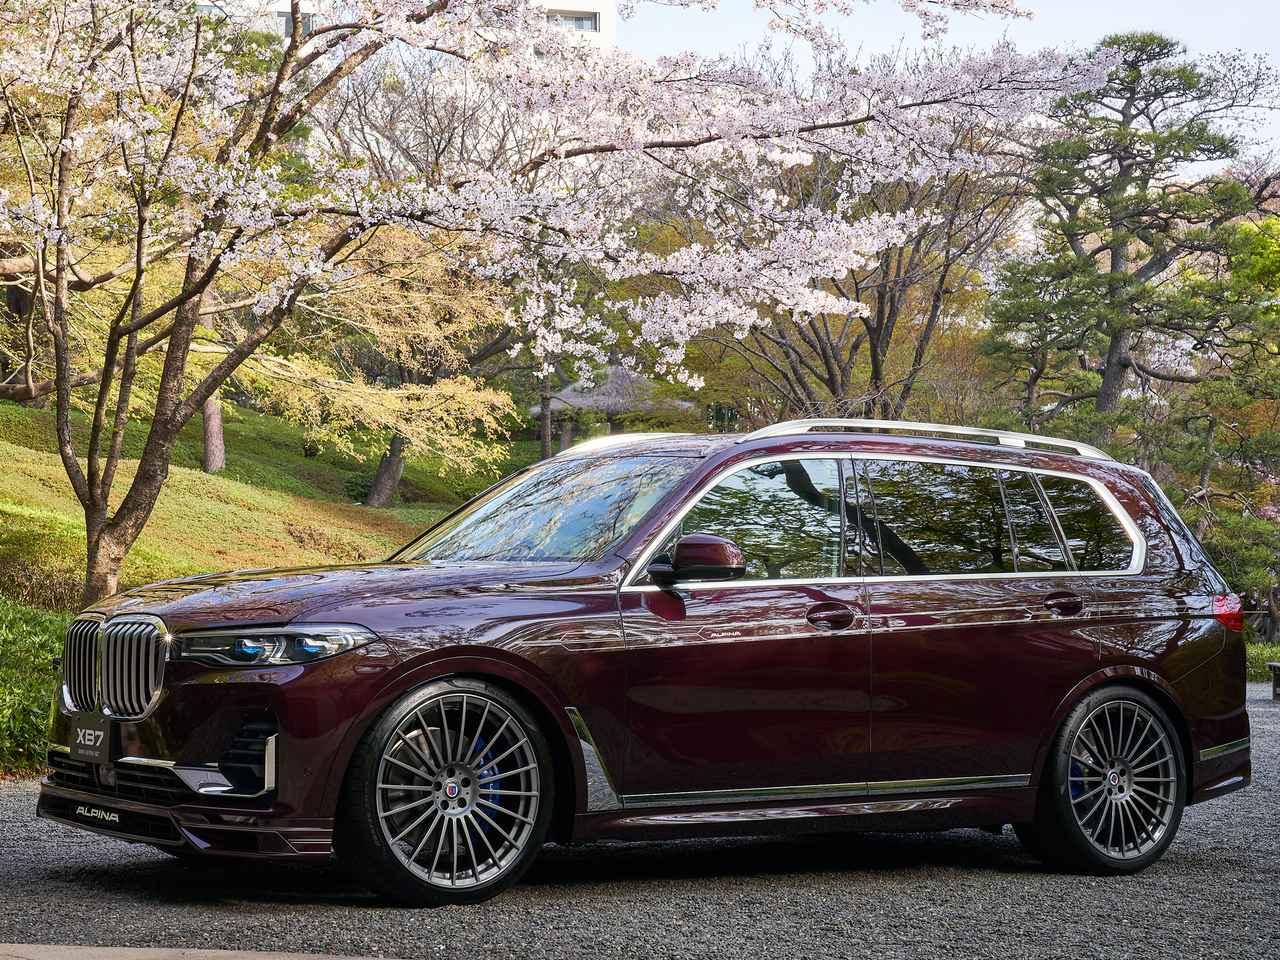 BMWアルピナが2021年に導入するビッグモデル2車種とは【輸入車事情2021-2022】